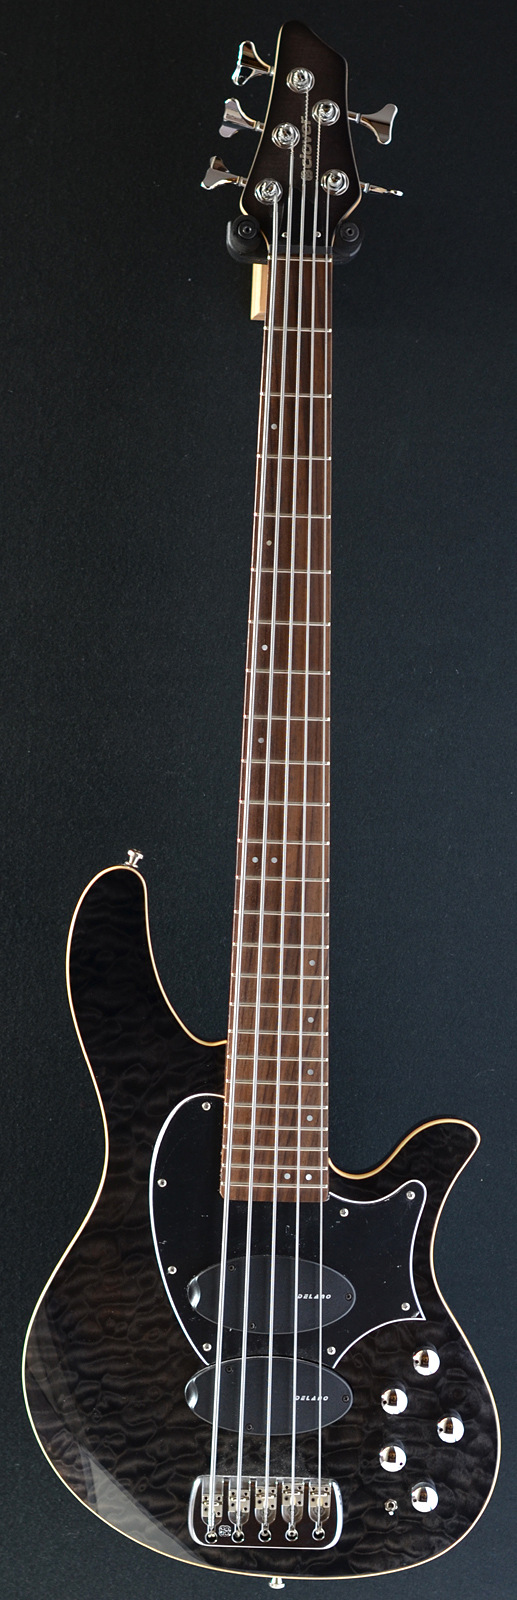 clover argo 5 2 five string via bass direct guitars amplifiers guitar bass cello music. Black Bedroom Furniture Sets. Home Design Ideas